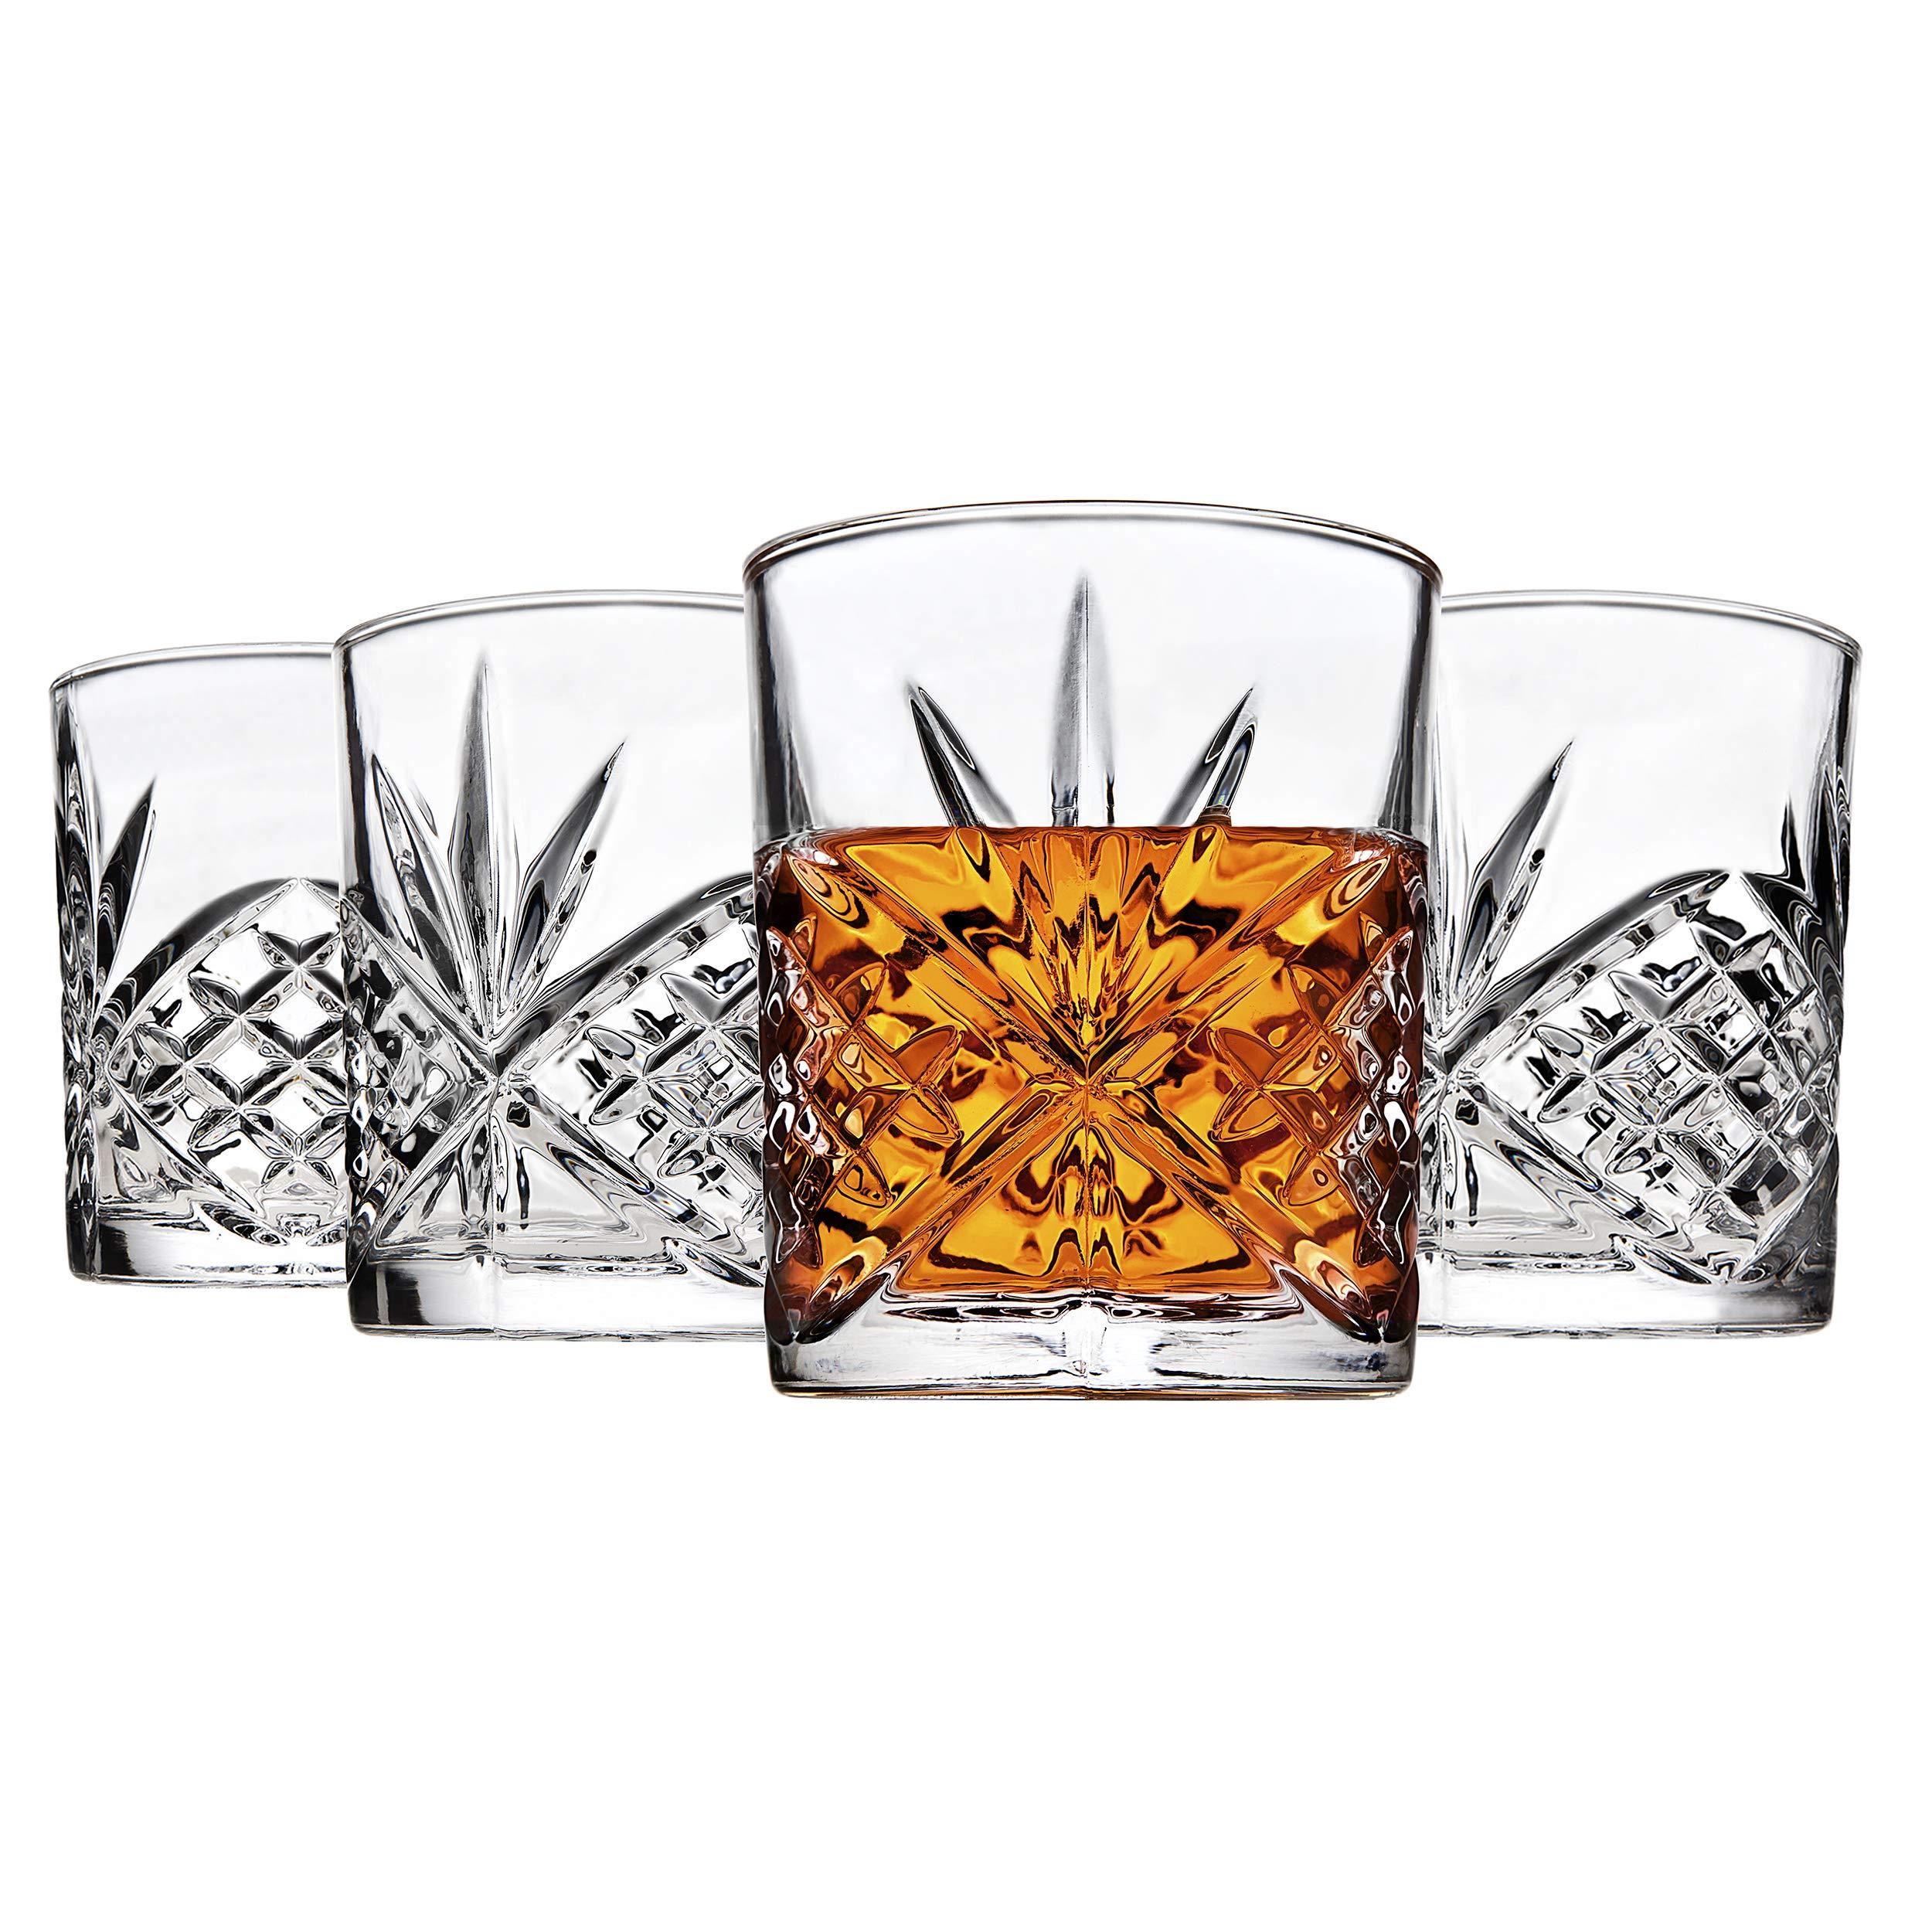 Godinger Dublin Double Fashioned Glasses